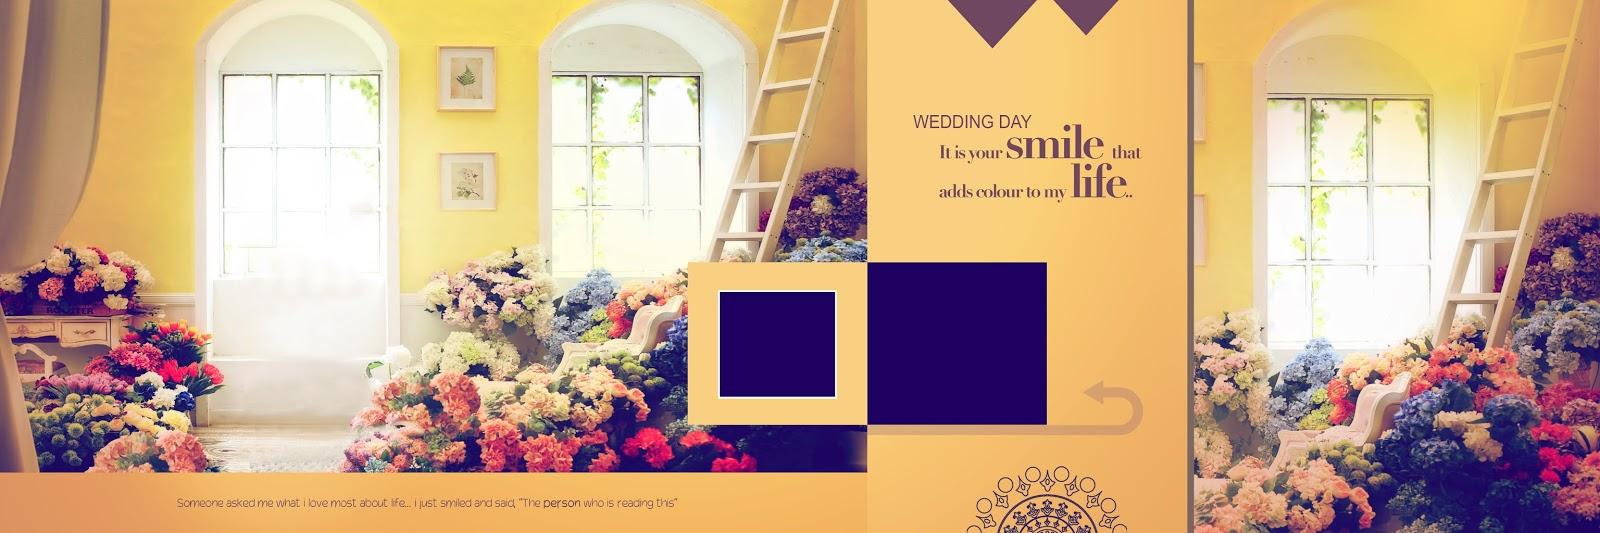 Psd Wedding Photo Album Design Templates 2019 Latest Wedding